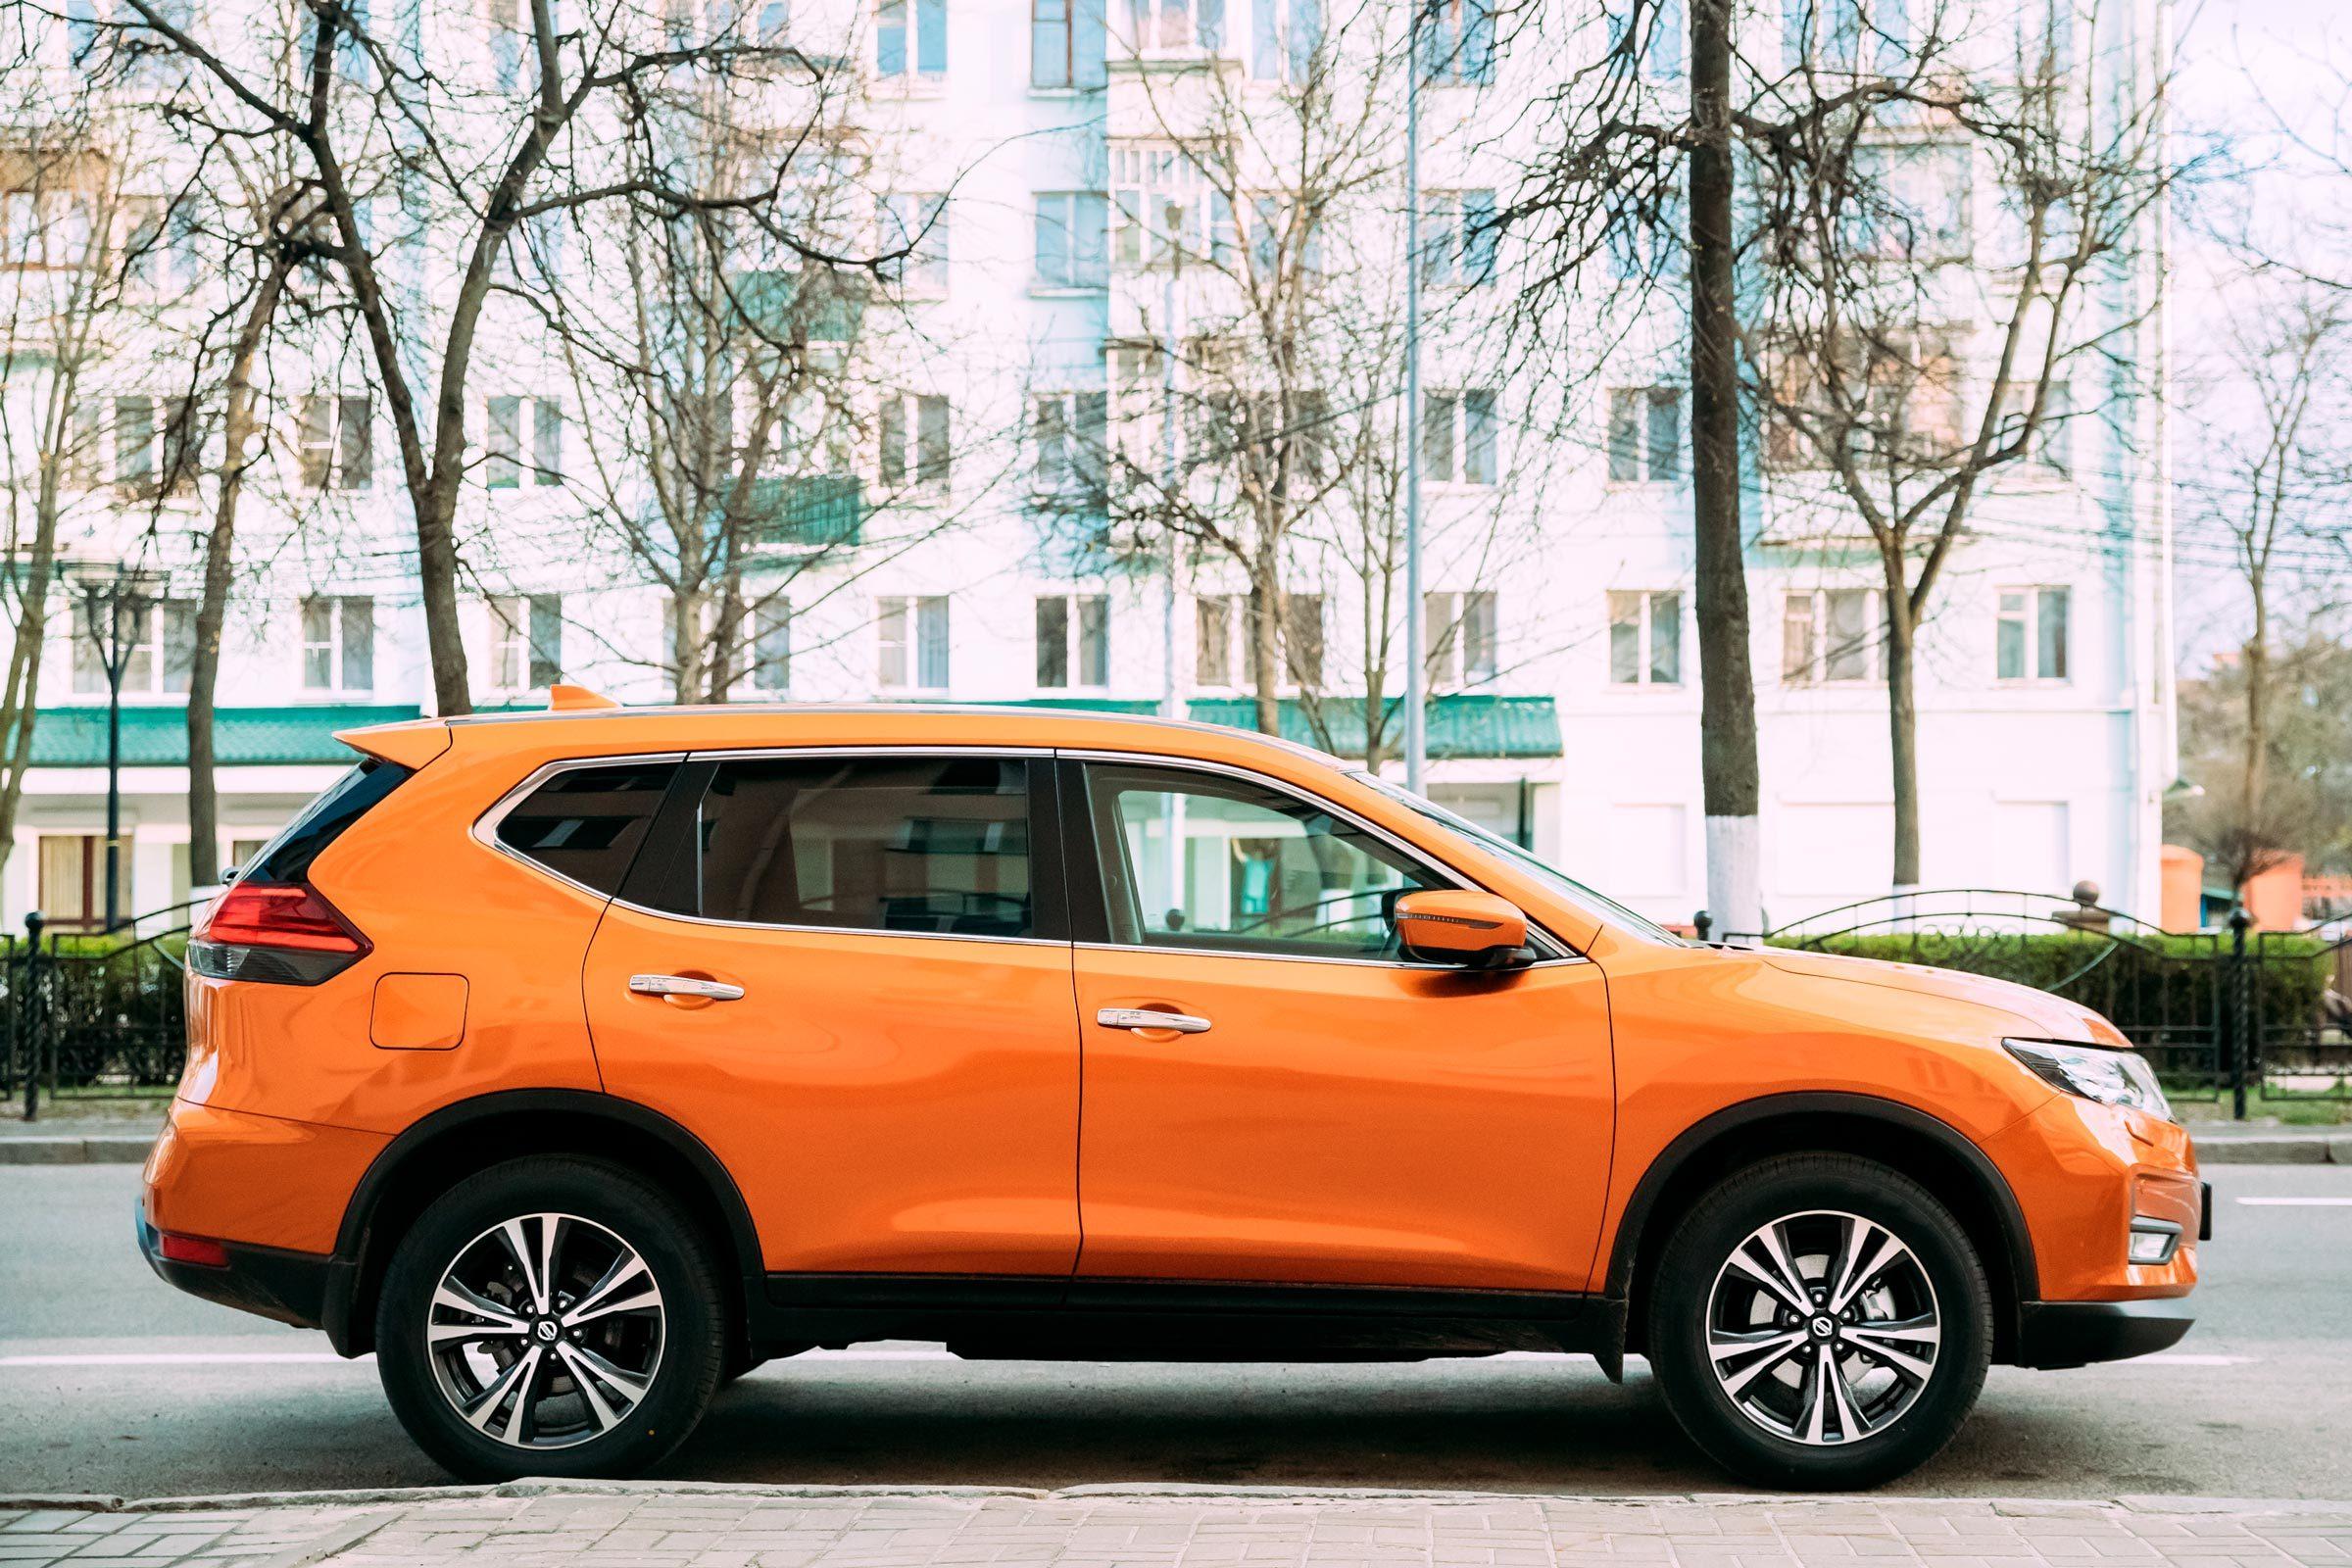 Orange Nissan X-Trail third generation Car Parked At Street. Side View